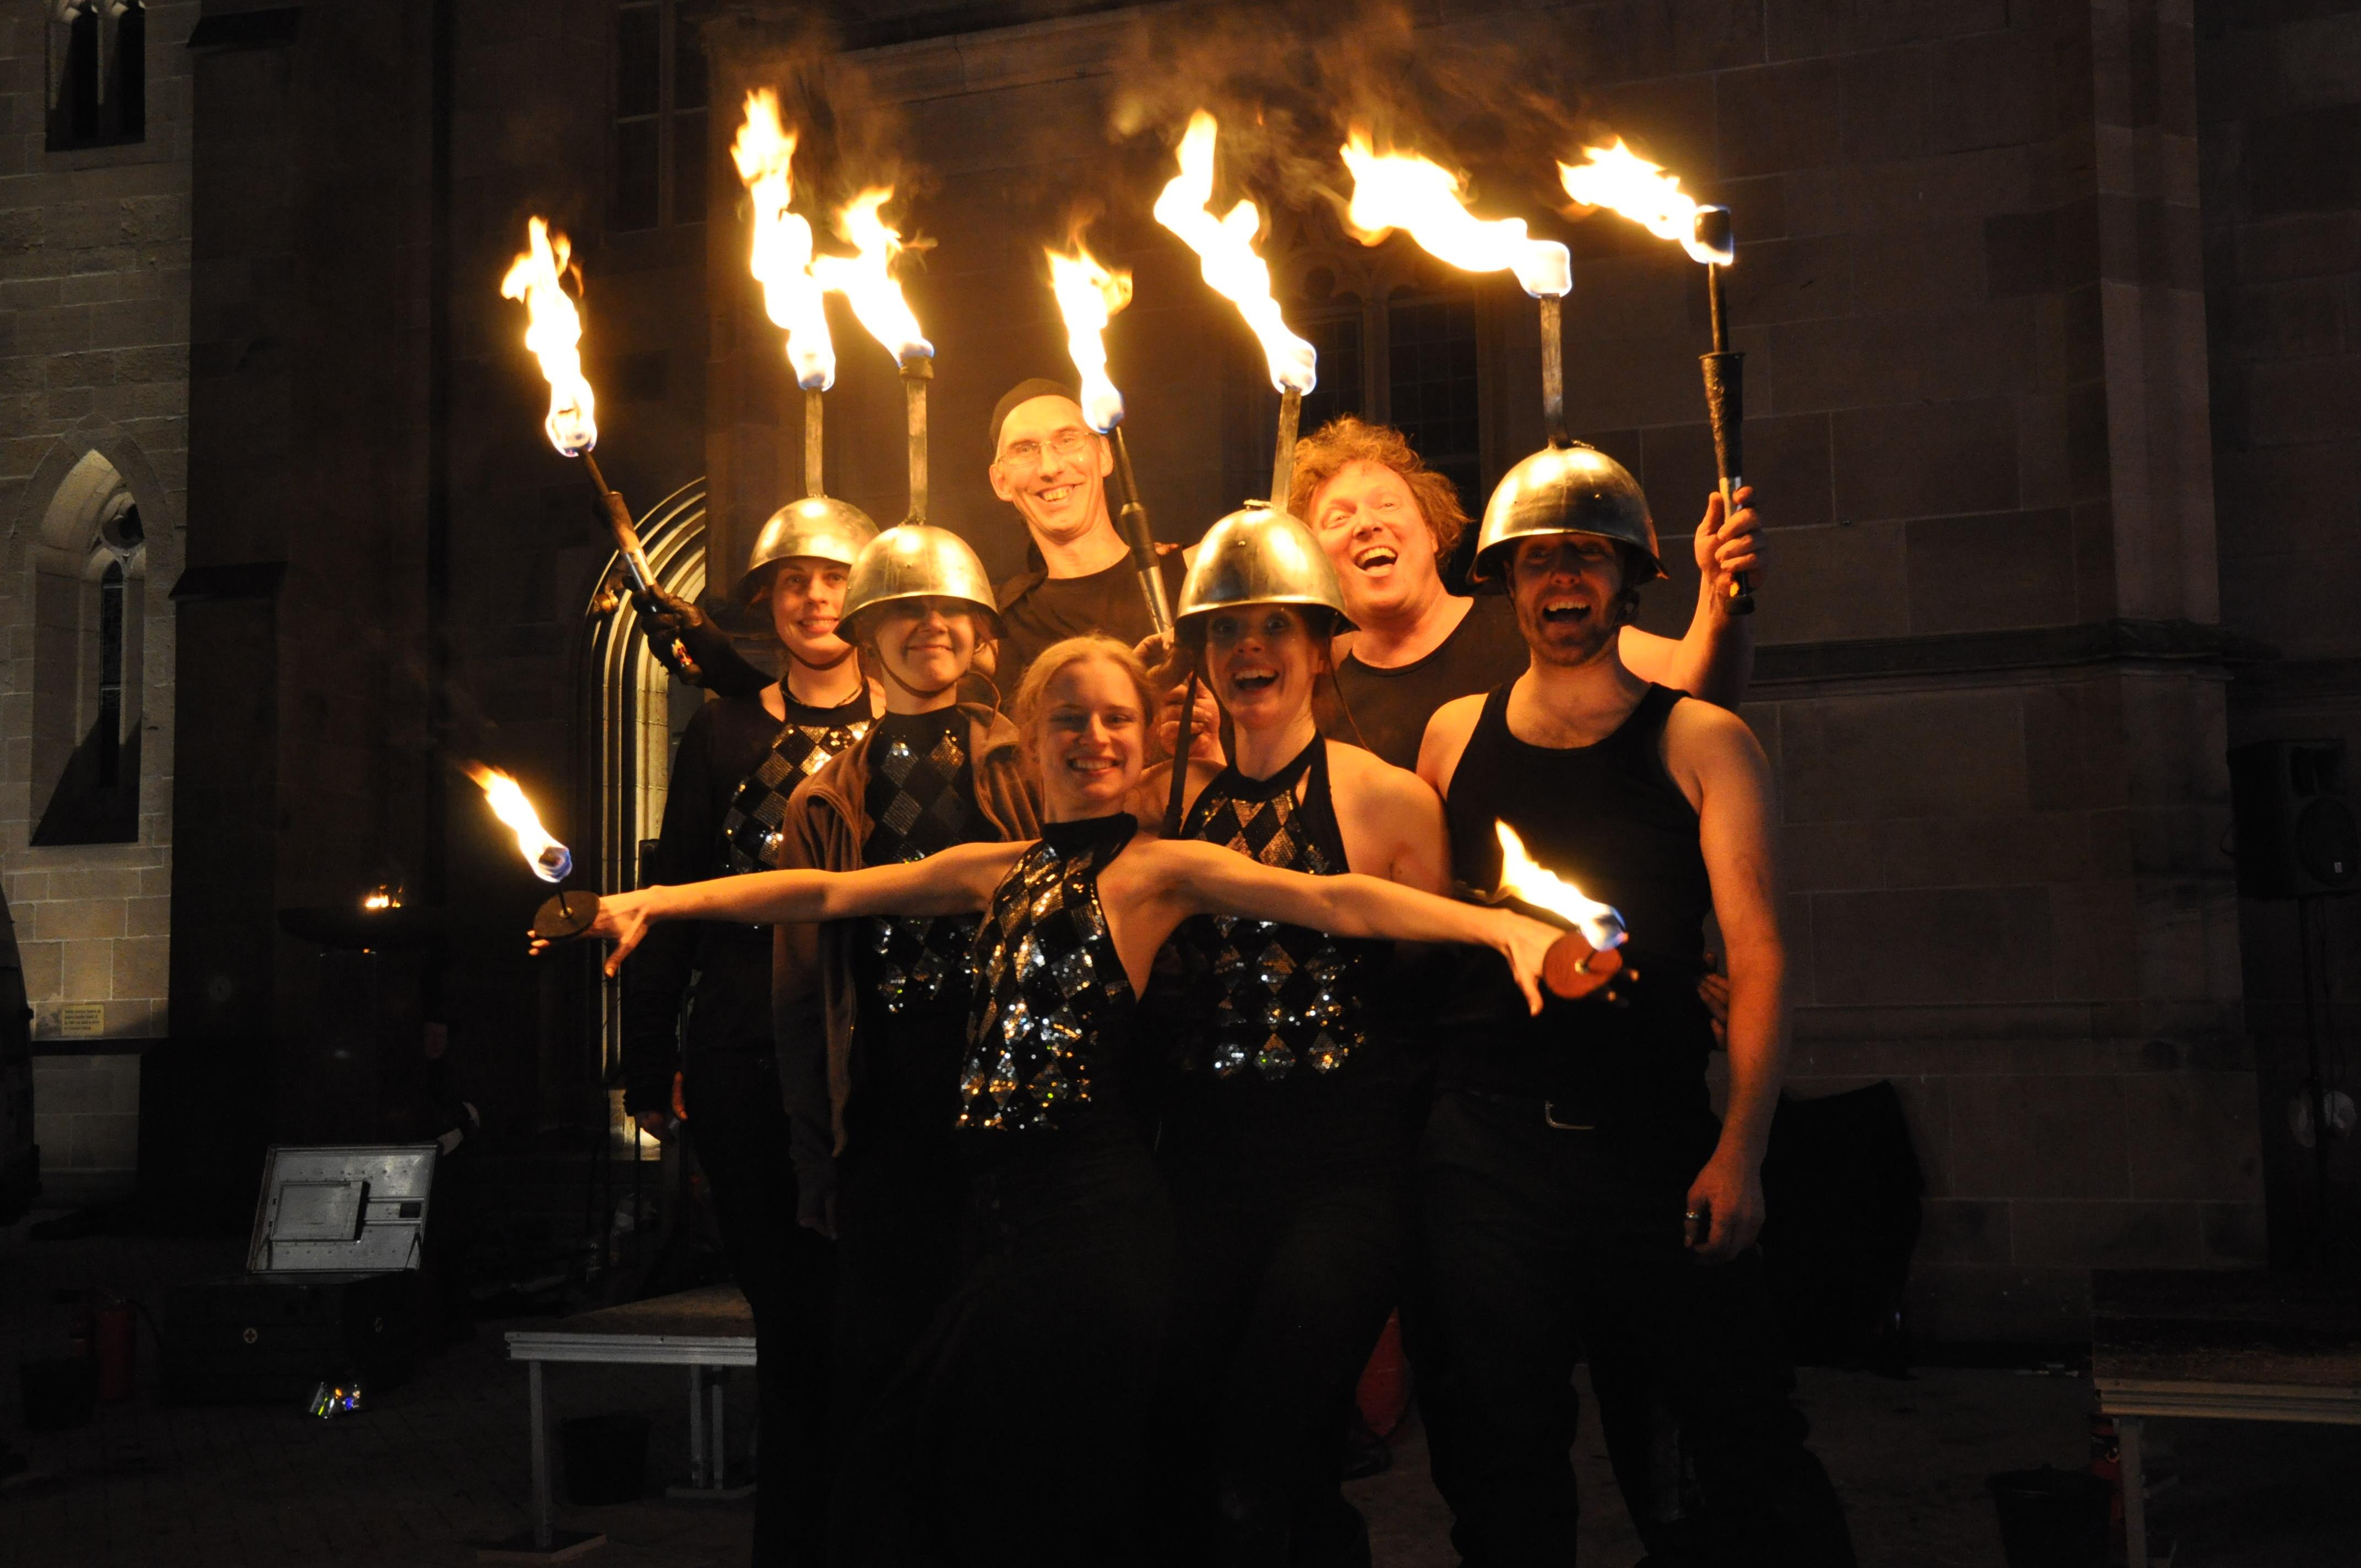 Heilbronn Feuershow